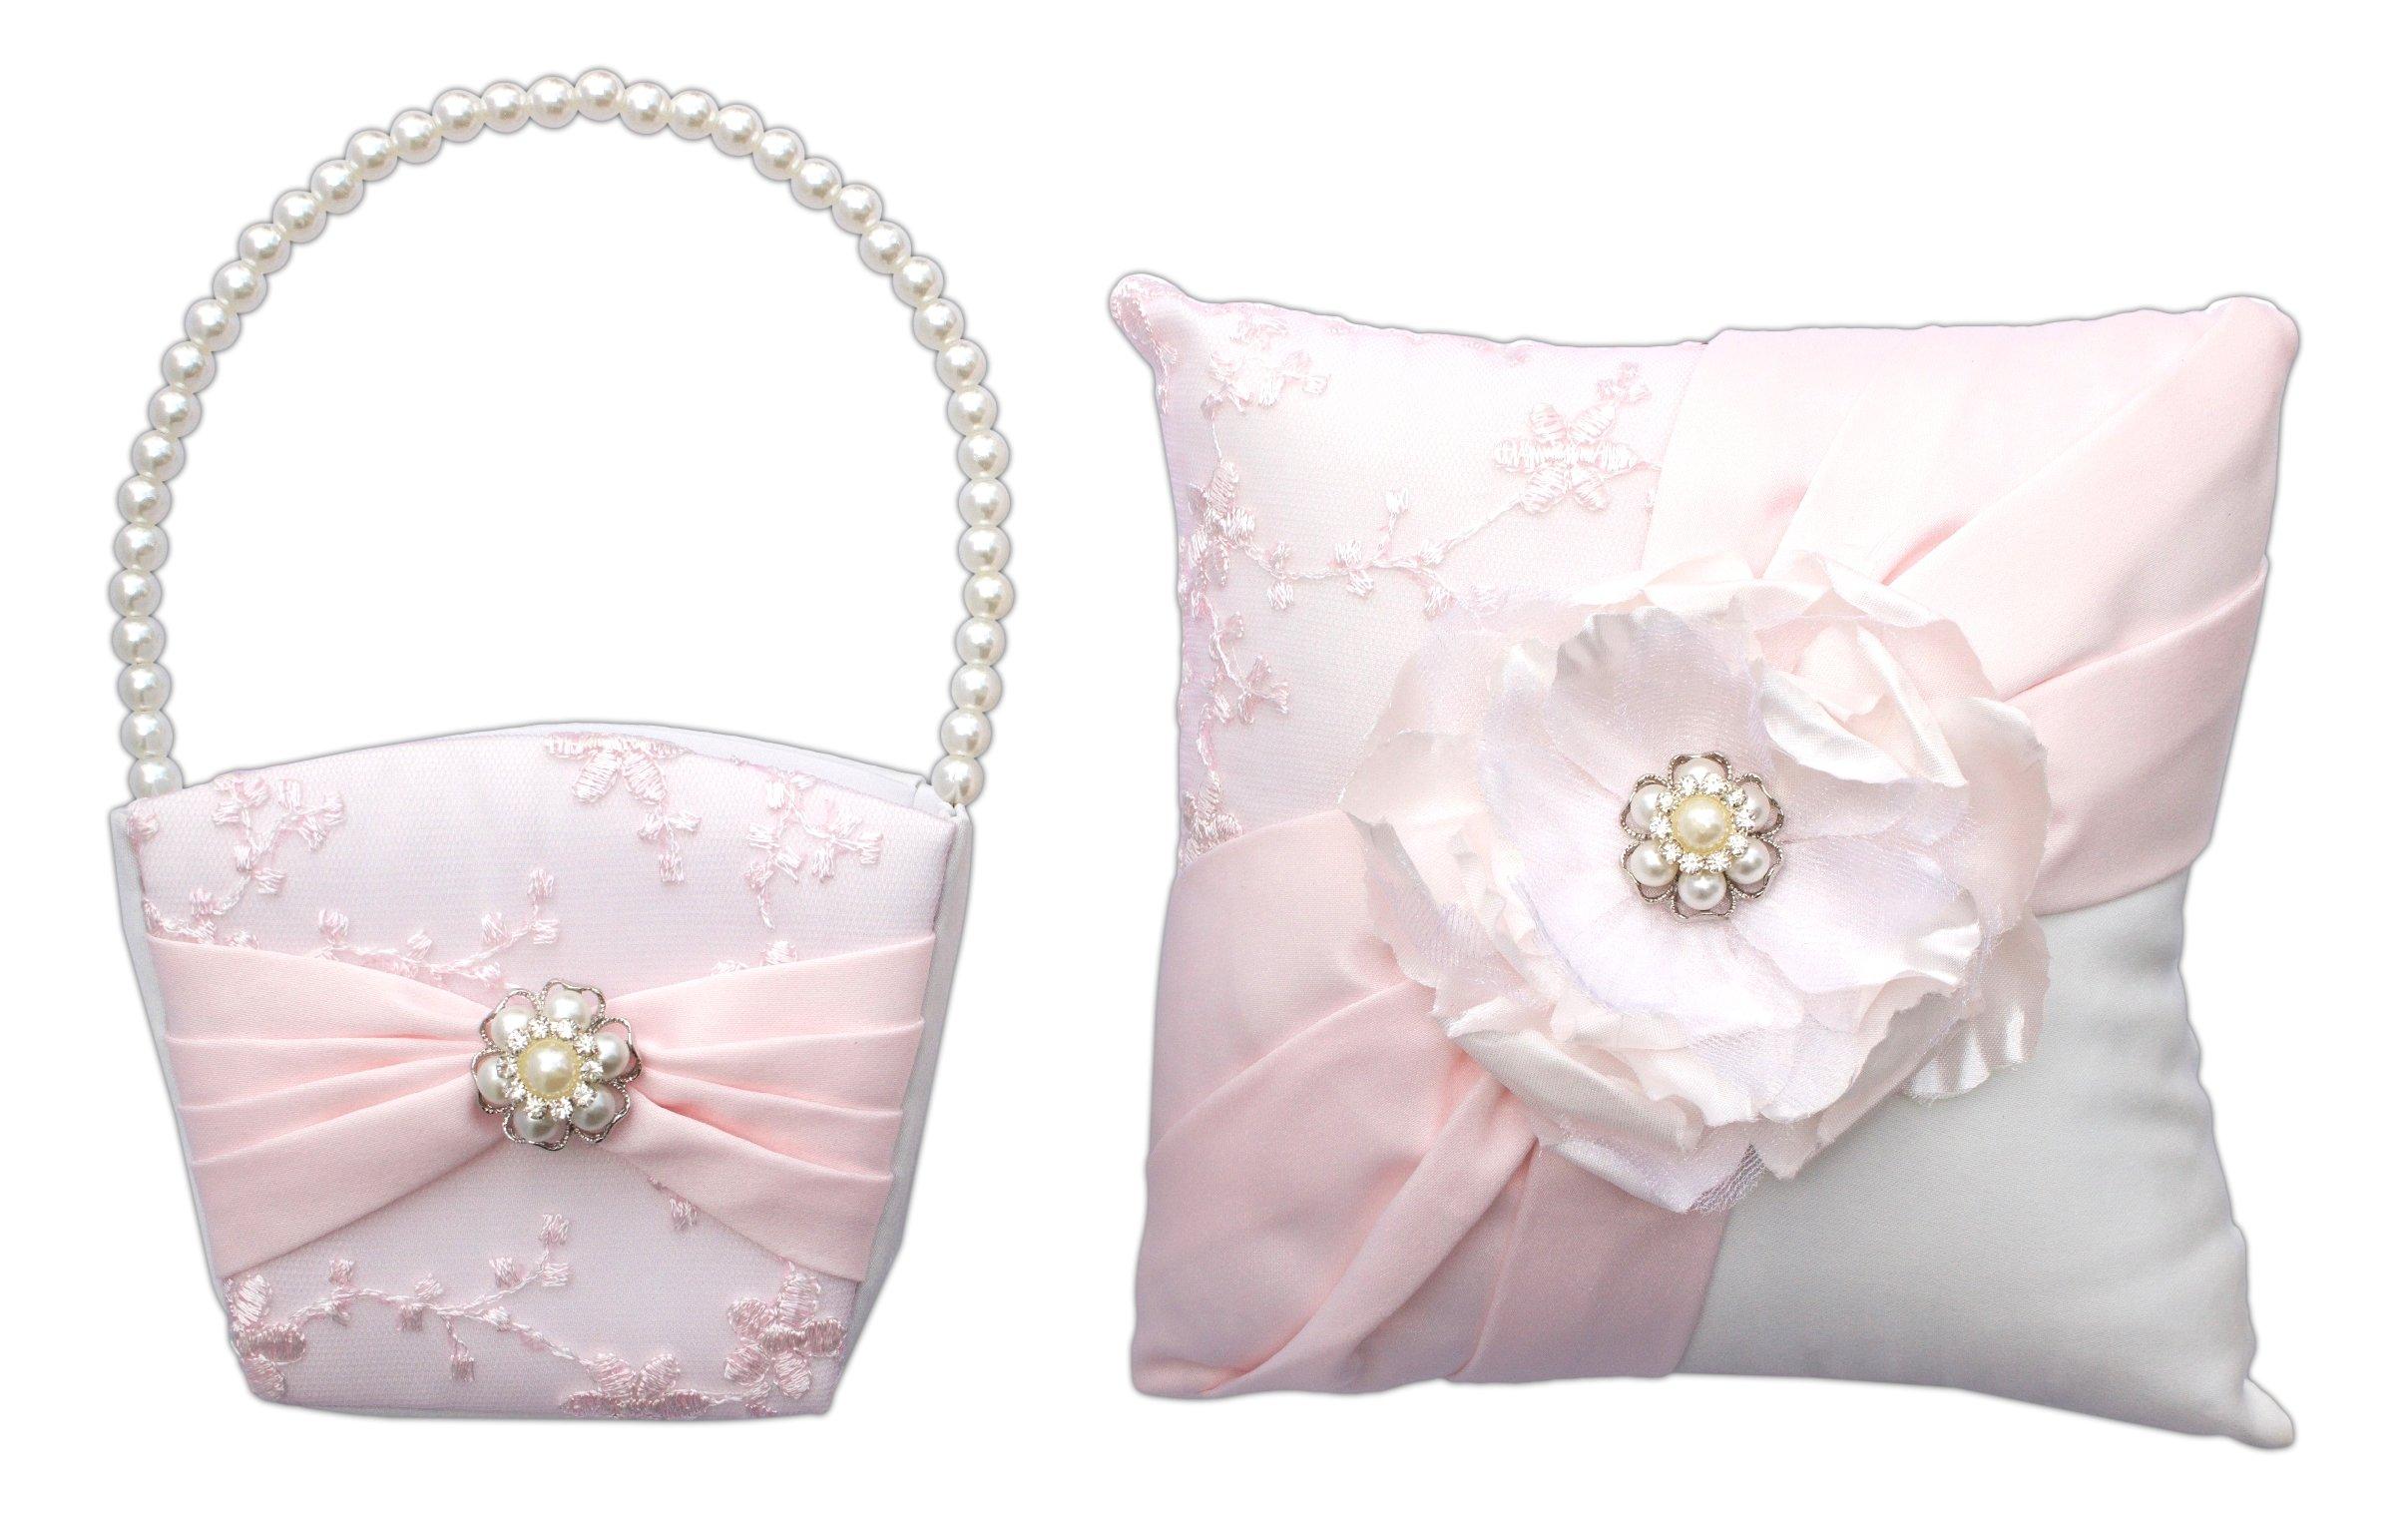 Bundle of Lillian Rose Ring Bearer Pillow and Flower Girl Basket (Blush Pink)